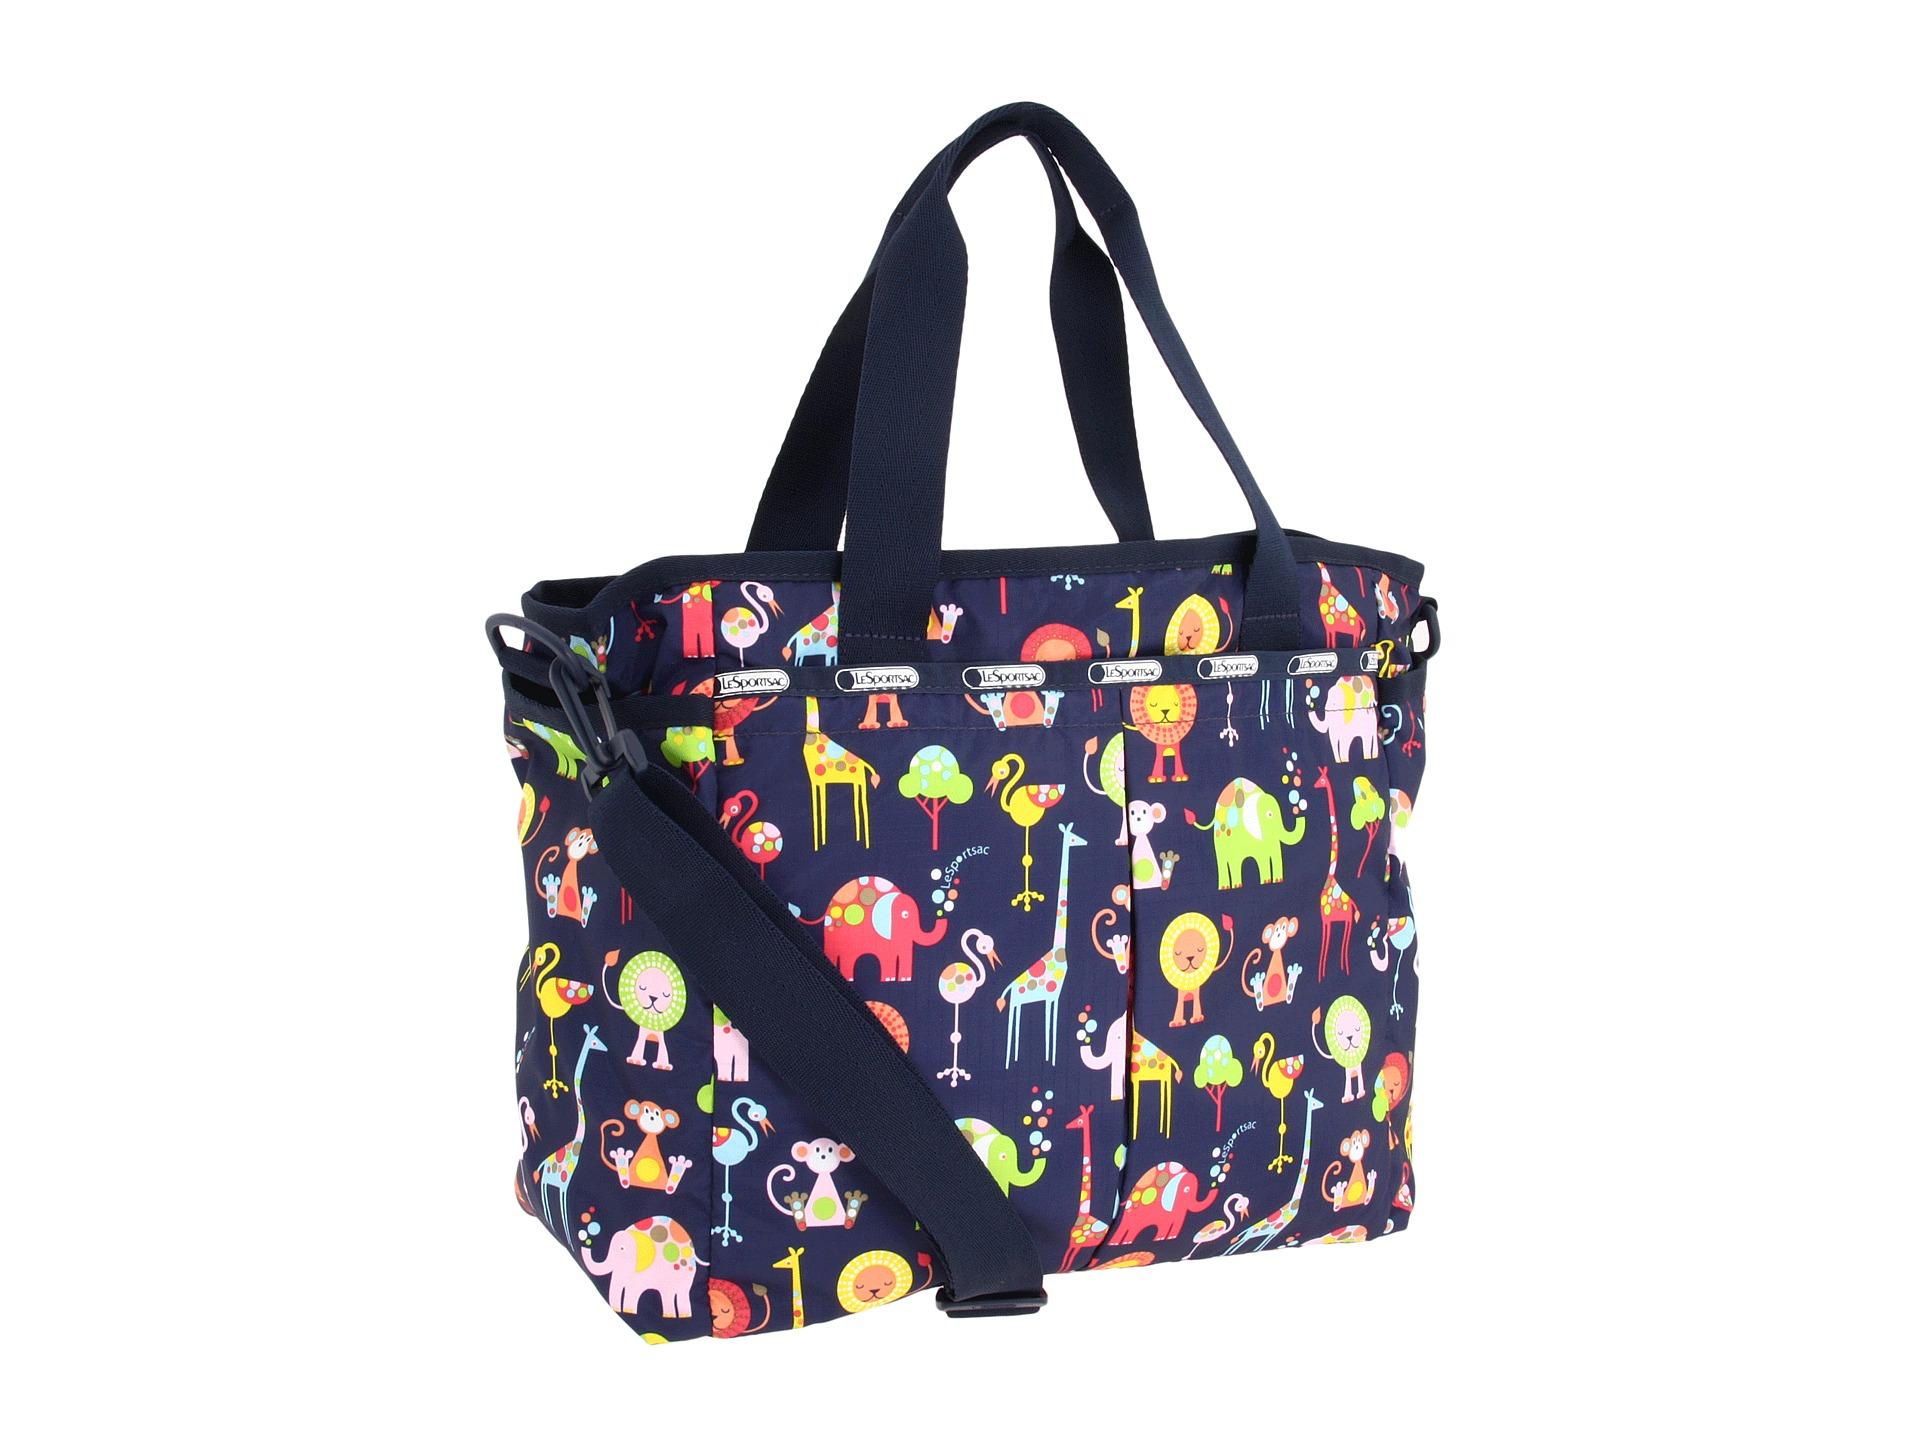 lesportsac ryan baby bag zapposcom free shipping both ways